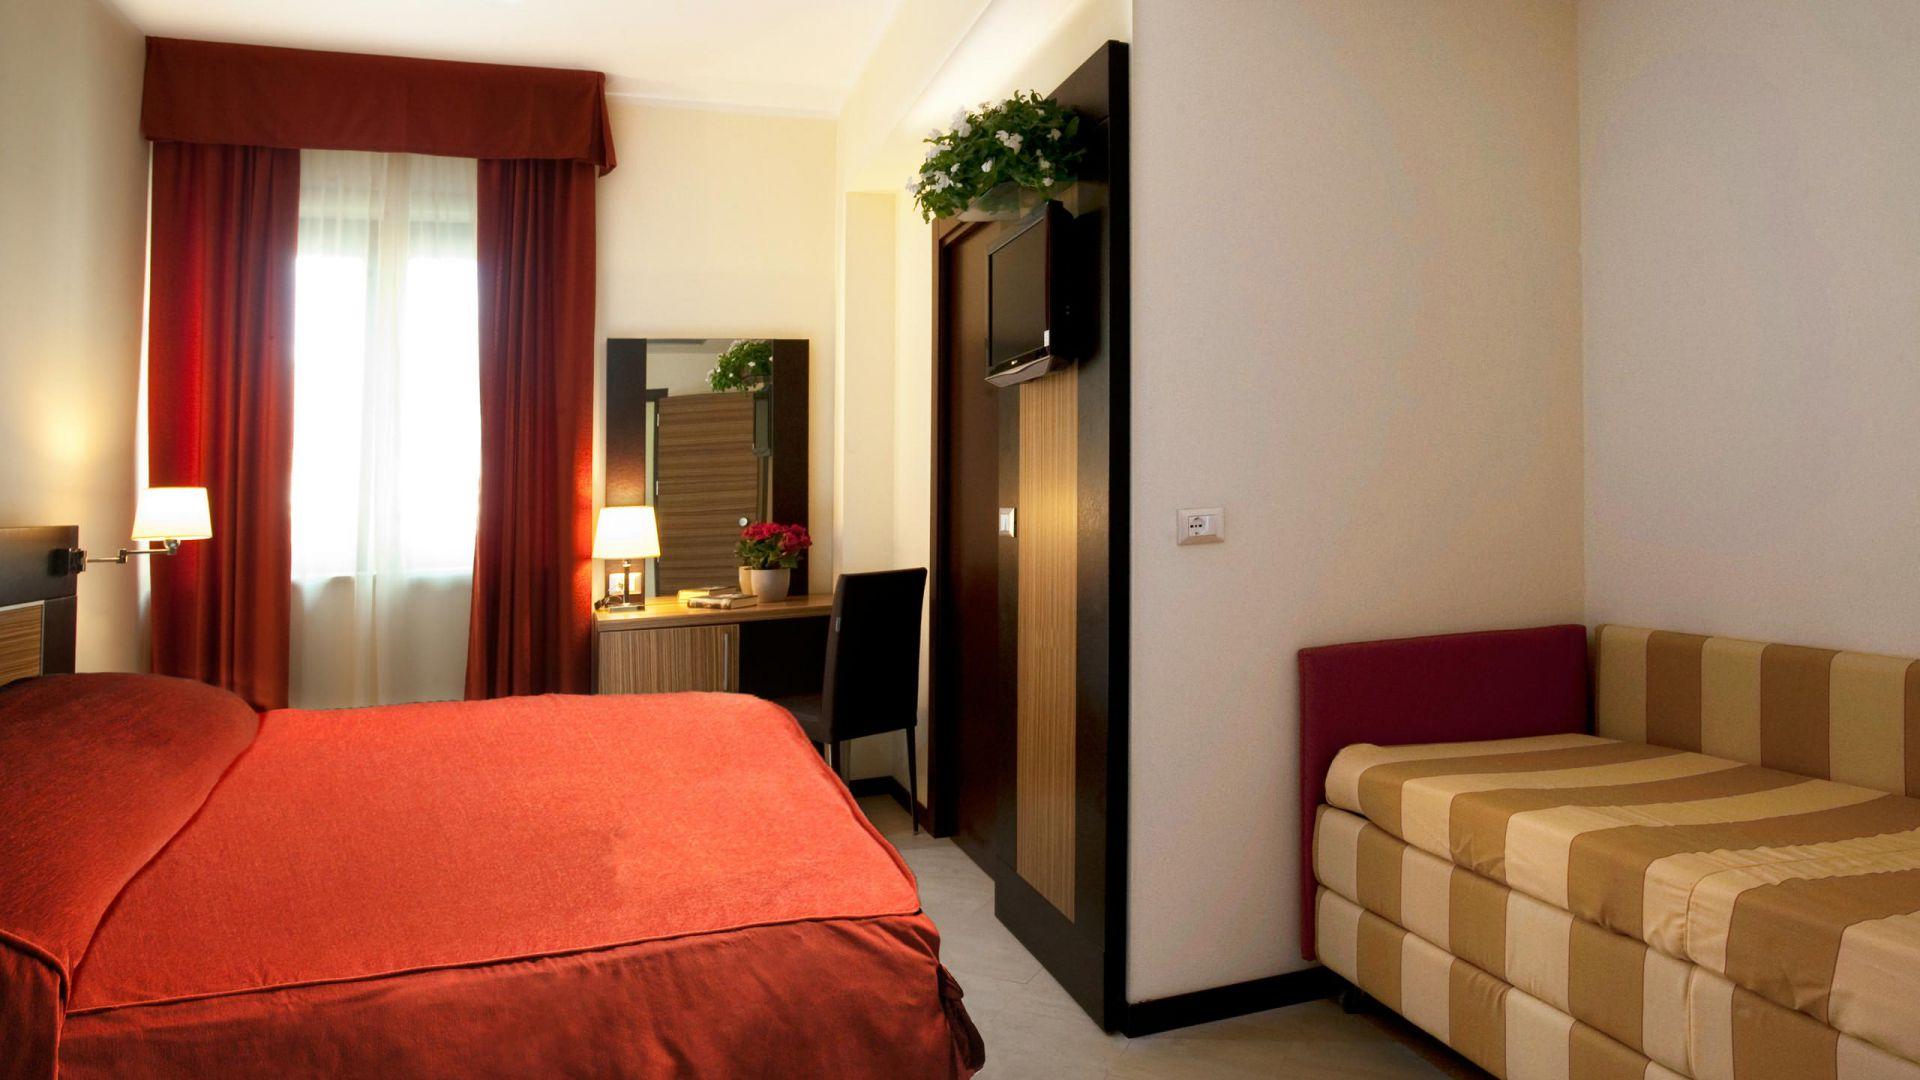 oc-hotel-villa-adriana-camere-011